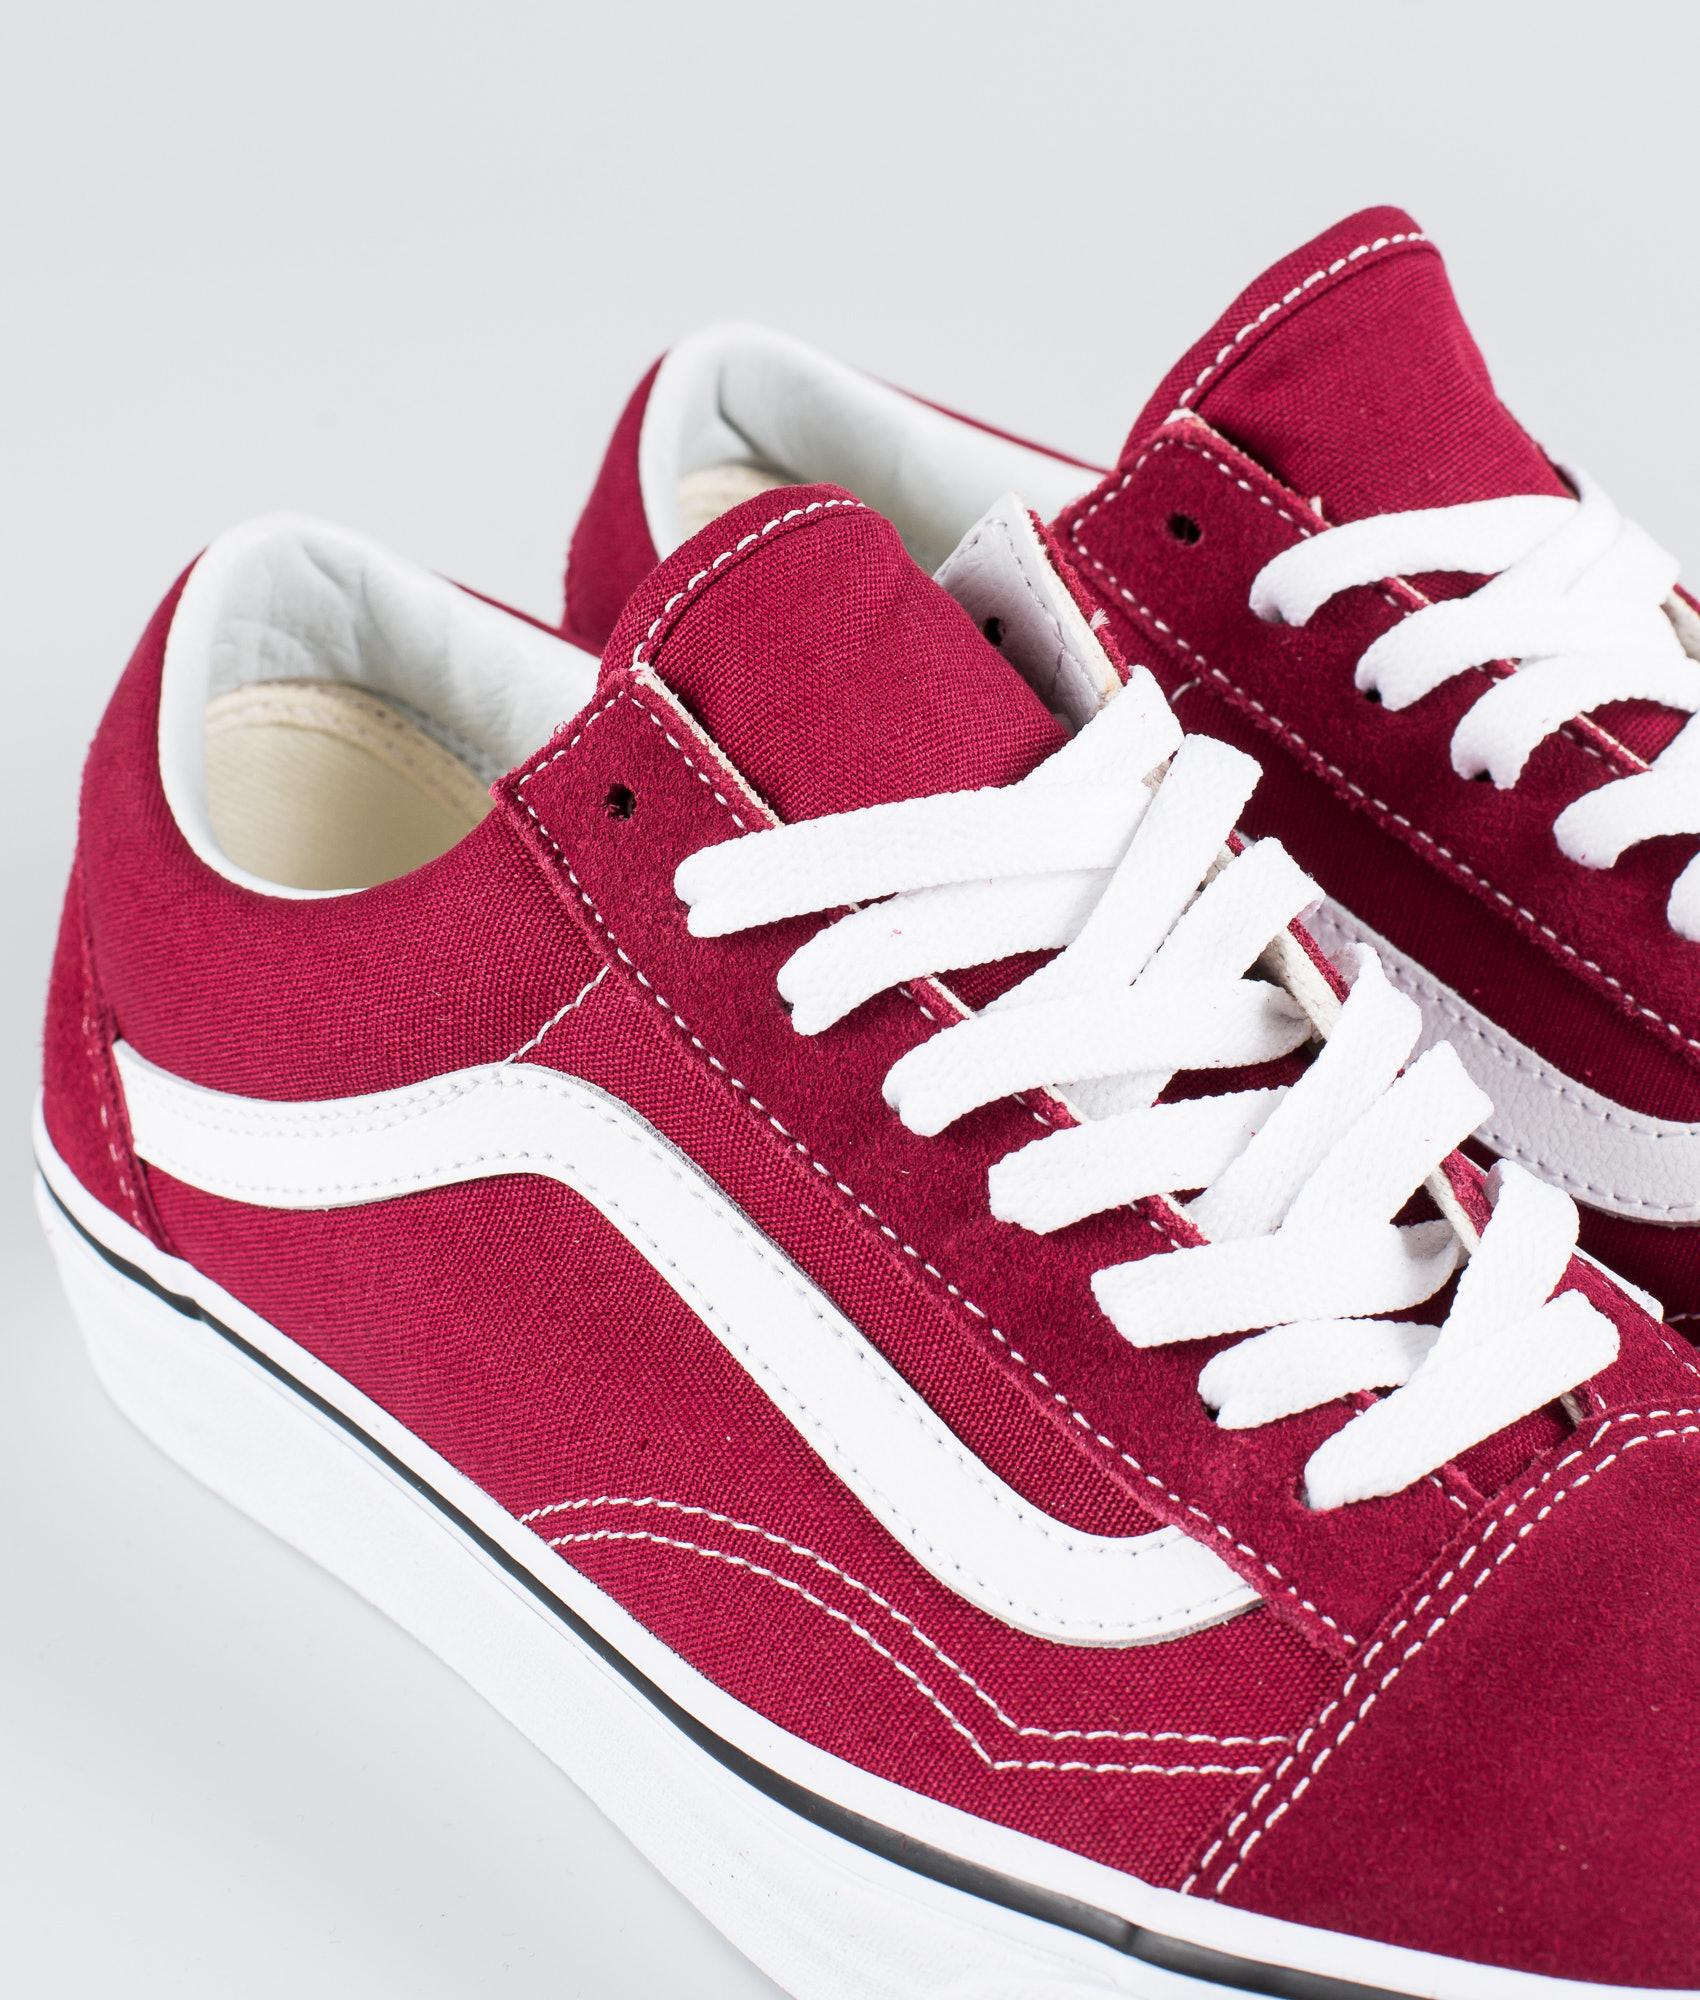 4b76f19e65 Vans Old Skool Shoes Rumba Red True White - Ridestore.com